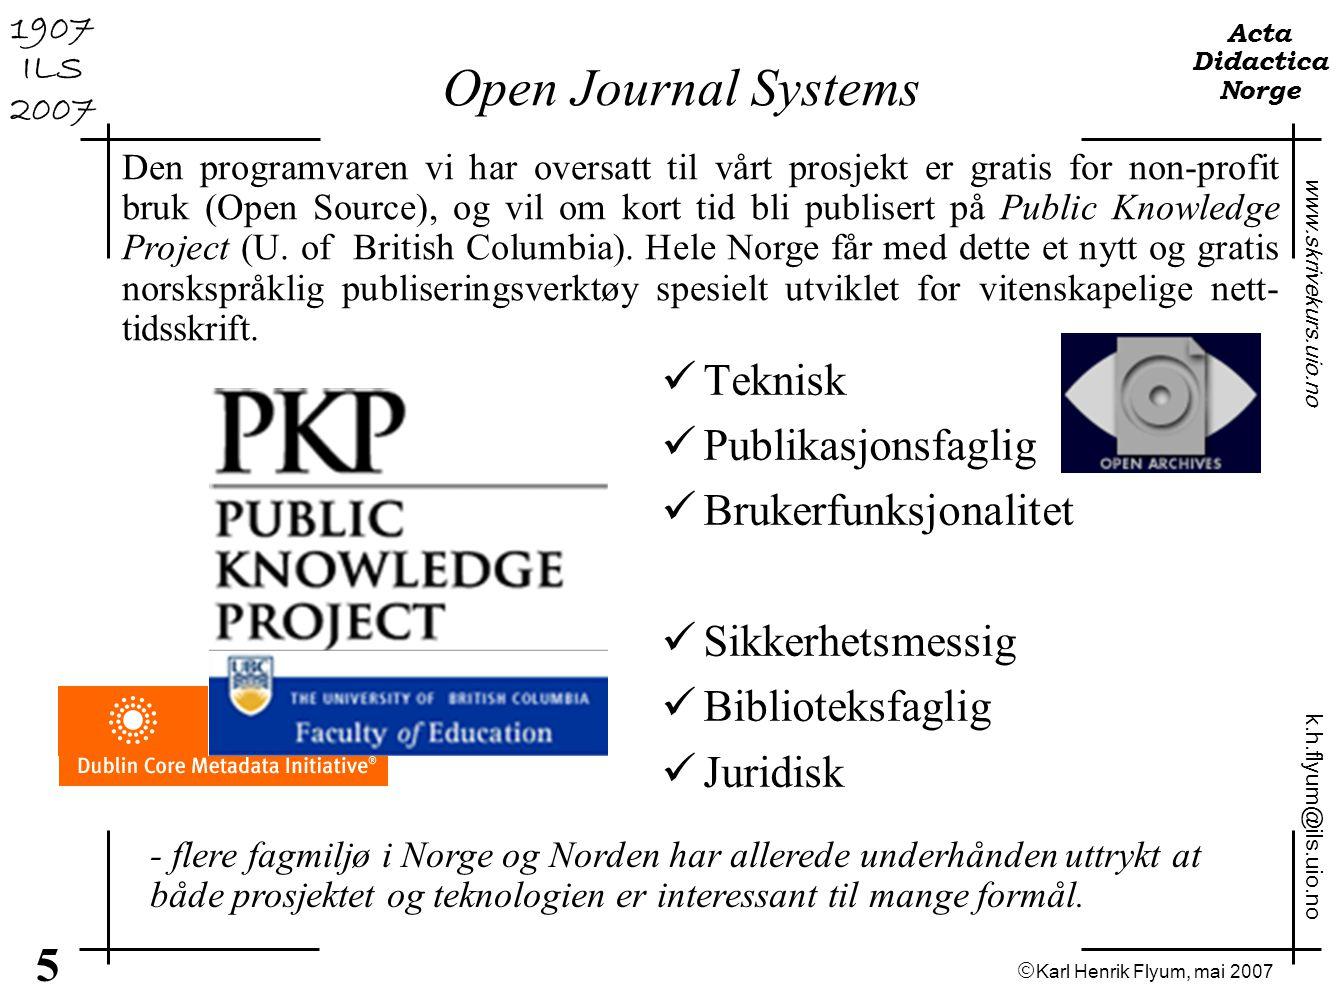  Karl Henrik Flyum, mai 2007 5 www.skrivekurs.uio.no k.h.flyum@ils.uio.no Acta Didactica Norge 1907 ILS 2007 Open Journal Systems T eknisk P ublikasj